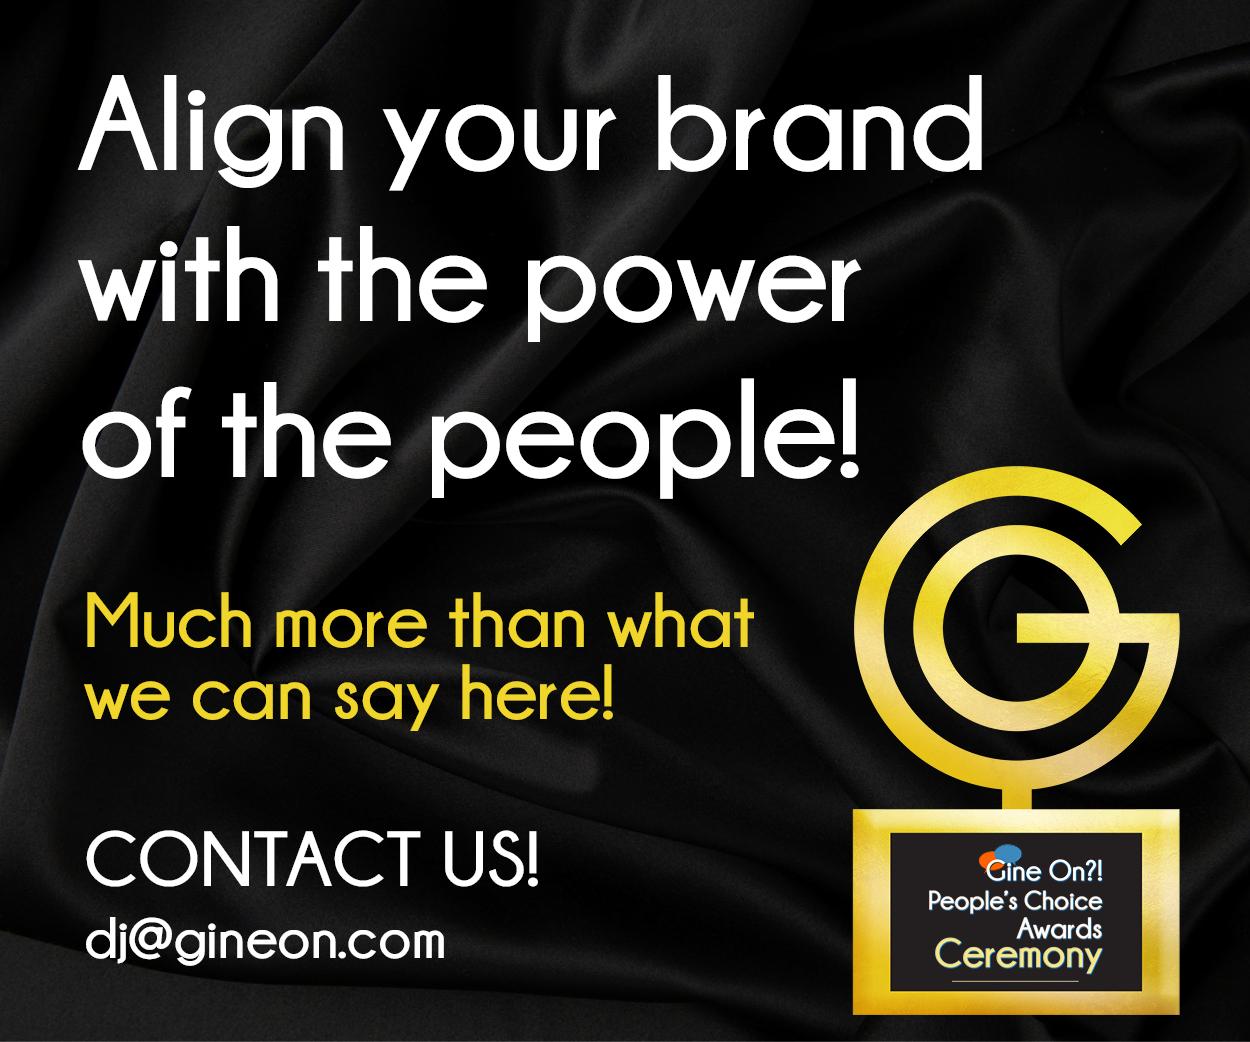 Align-Your-Brand-Website-Ad.jpg